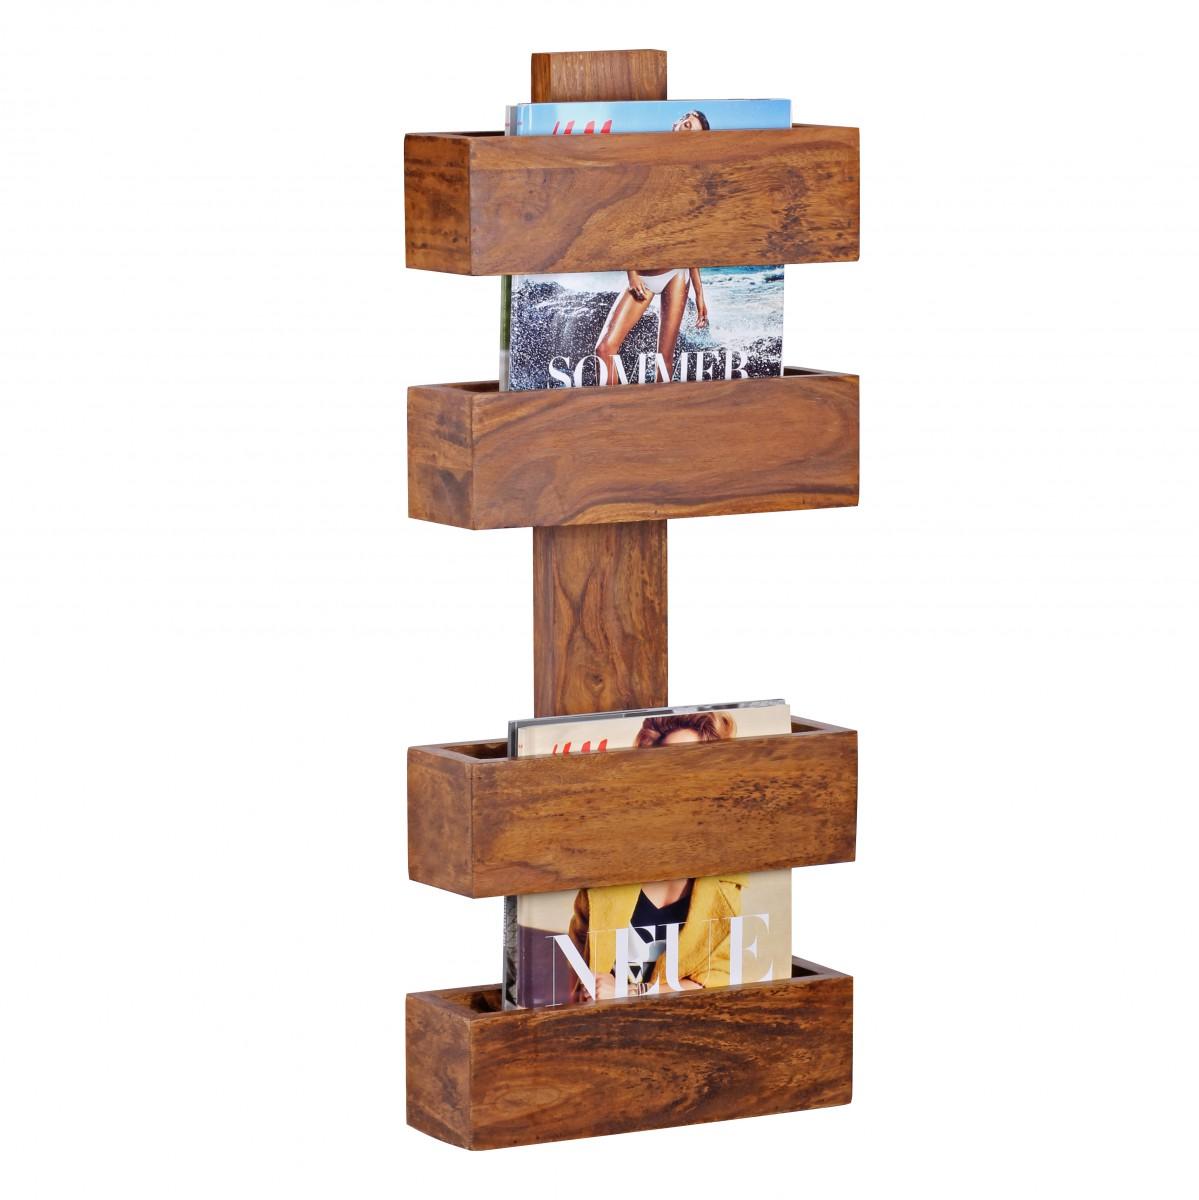 Massivholz Sheesham Wandregal Zeitungshalter 30 x 10 cm Neu